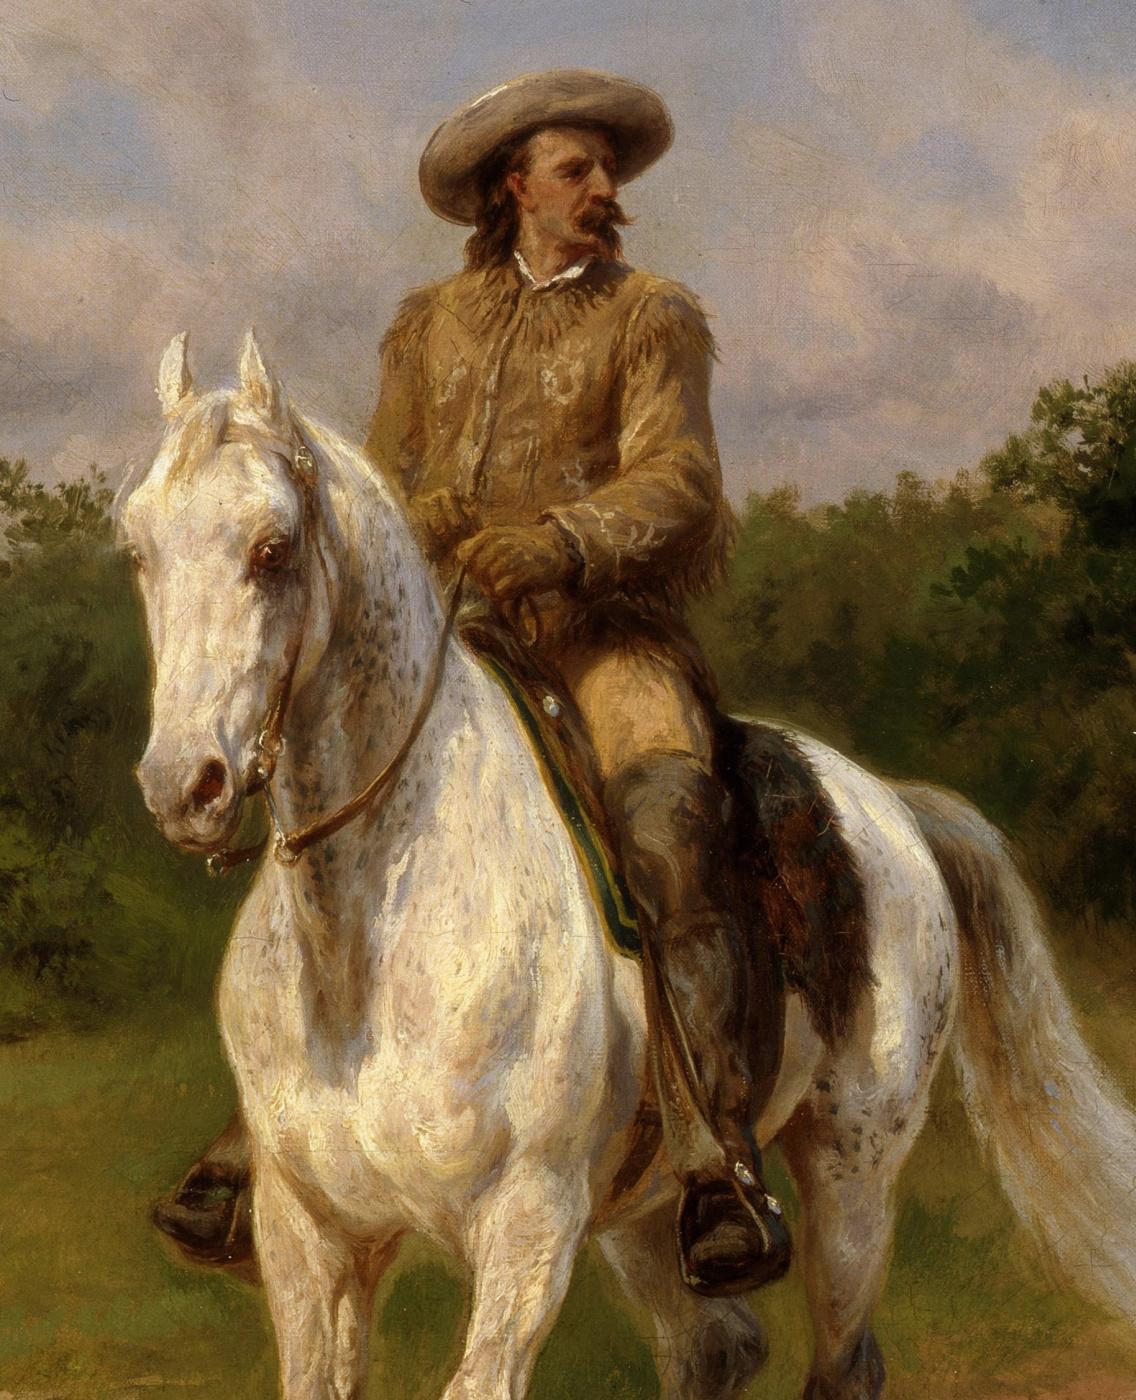 Rose Bonhur. Colonel William F. Cody (Buffalo Bill). Fragment